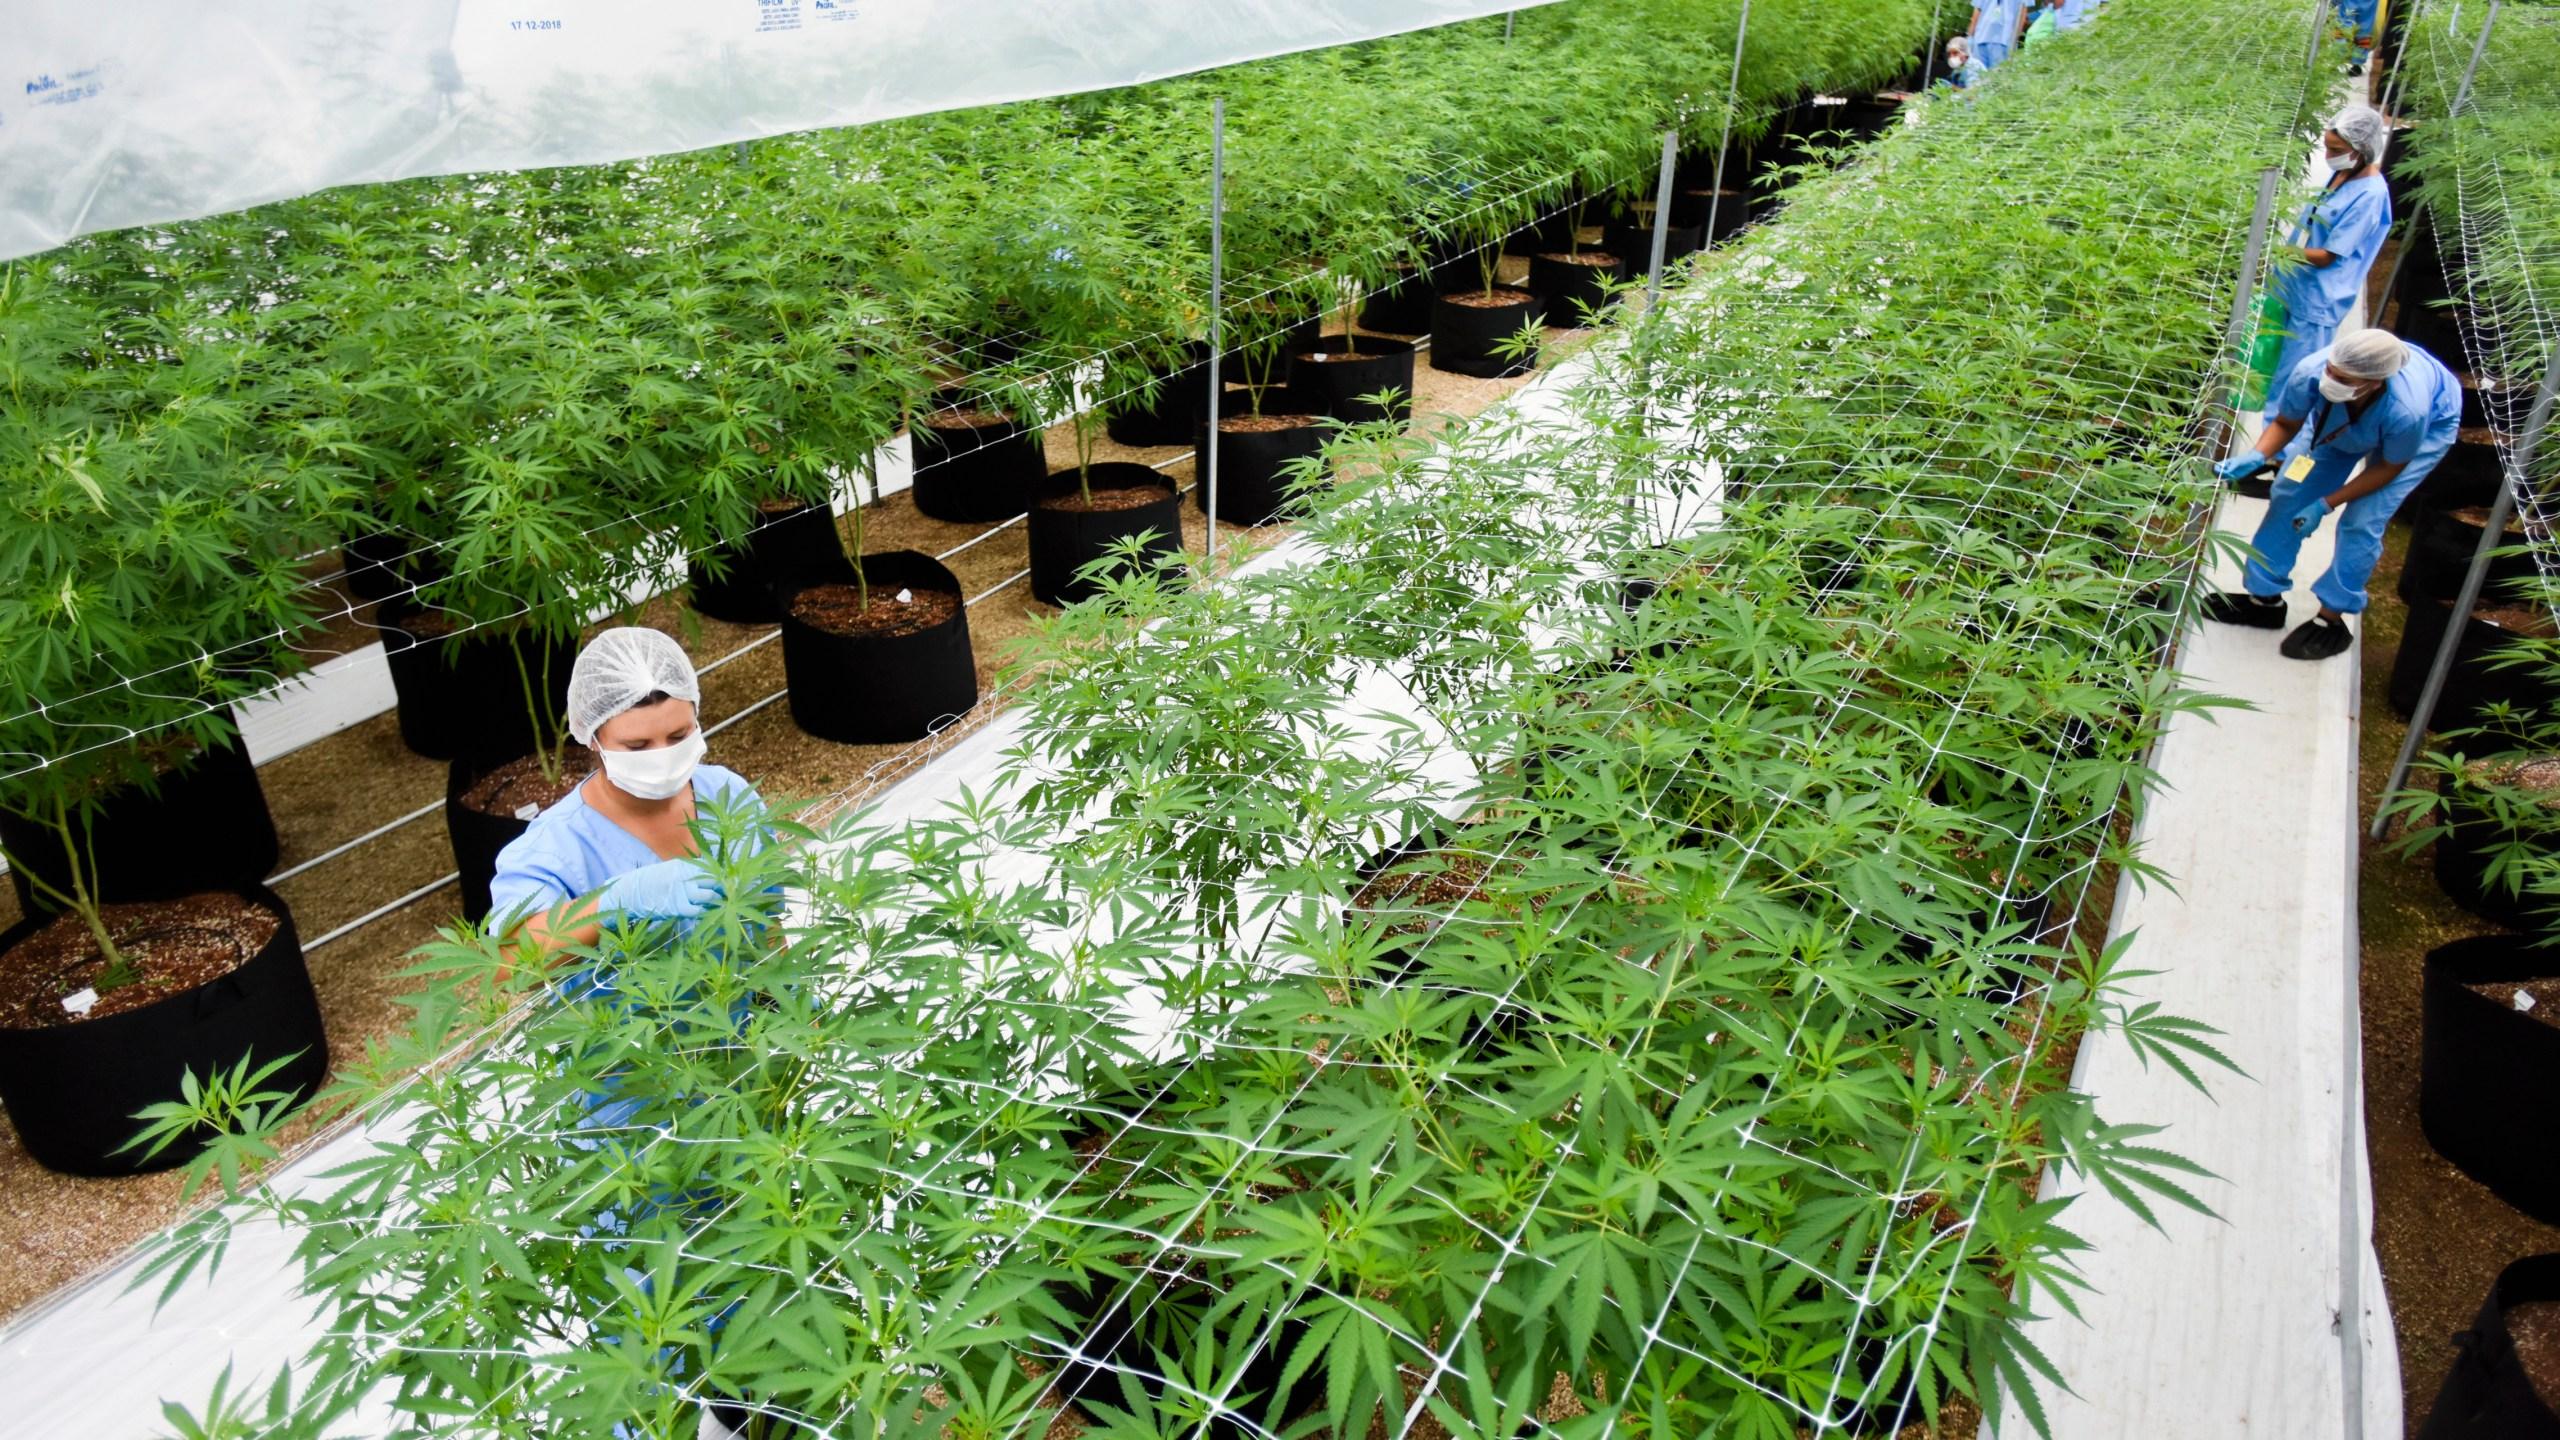 Uruguay_Latin_America_Europe_Medical_Marijuana_50267-159532.jpg56481063